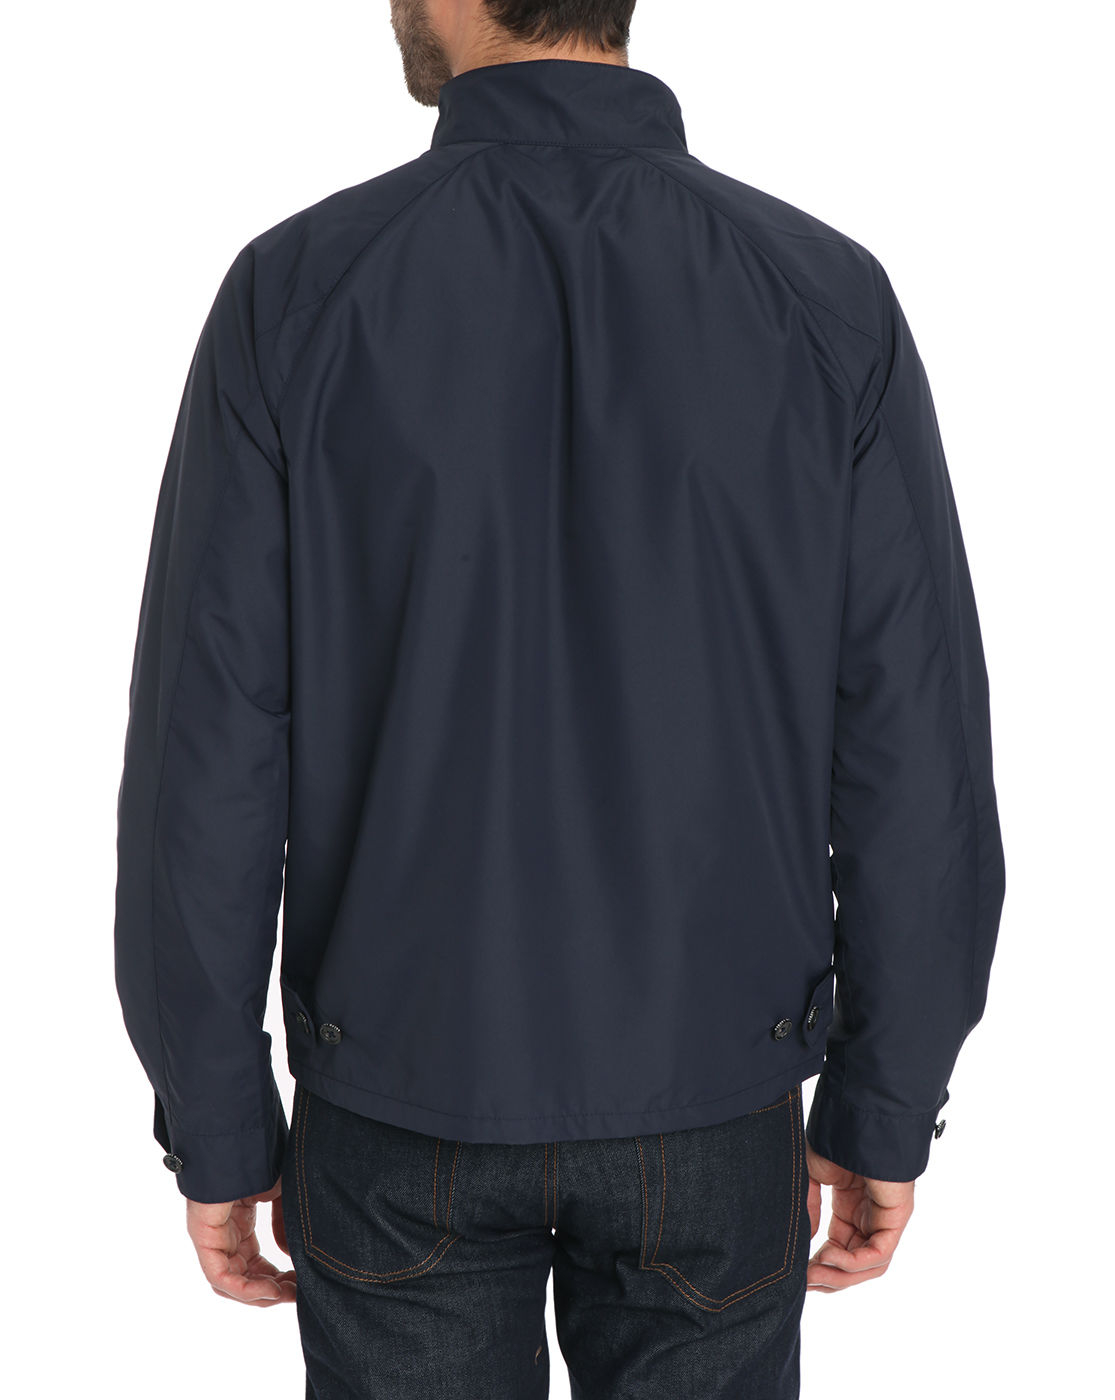 polo ralph lauren navy blue nylon raglan jacket in blue for men navy. Black Bedroom Furniture Sets. Home Design Ideas